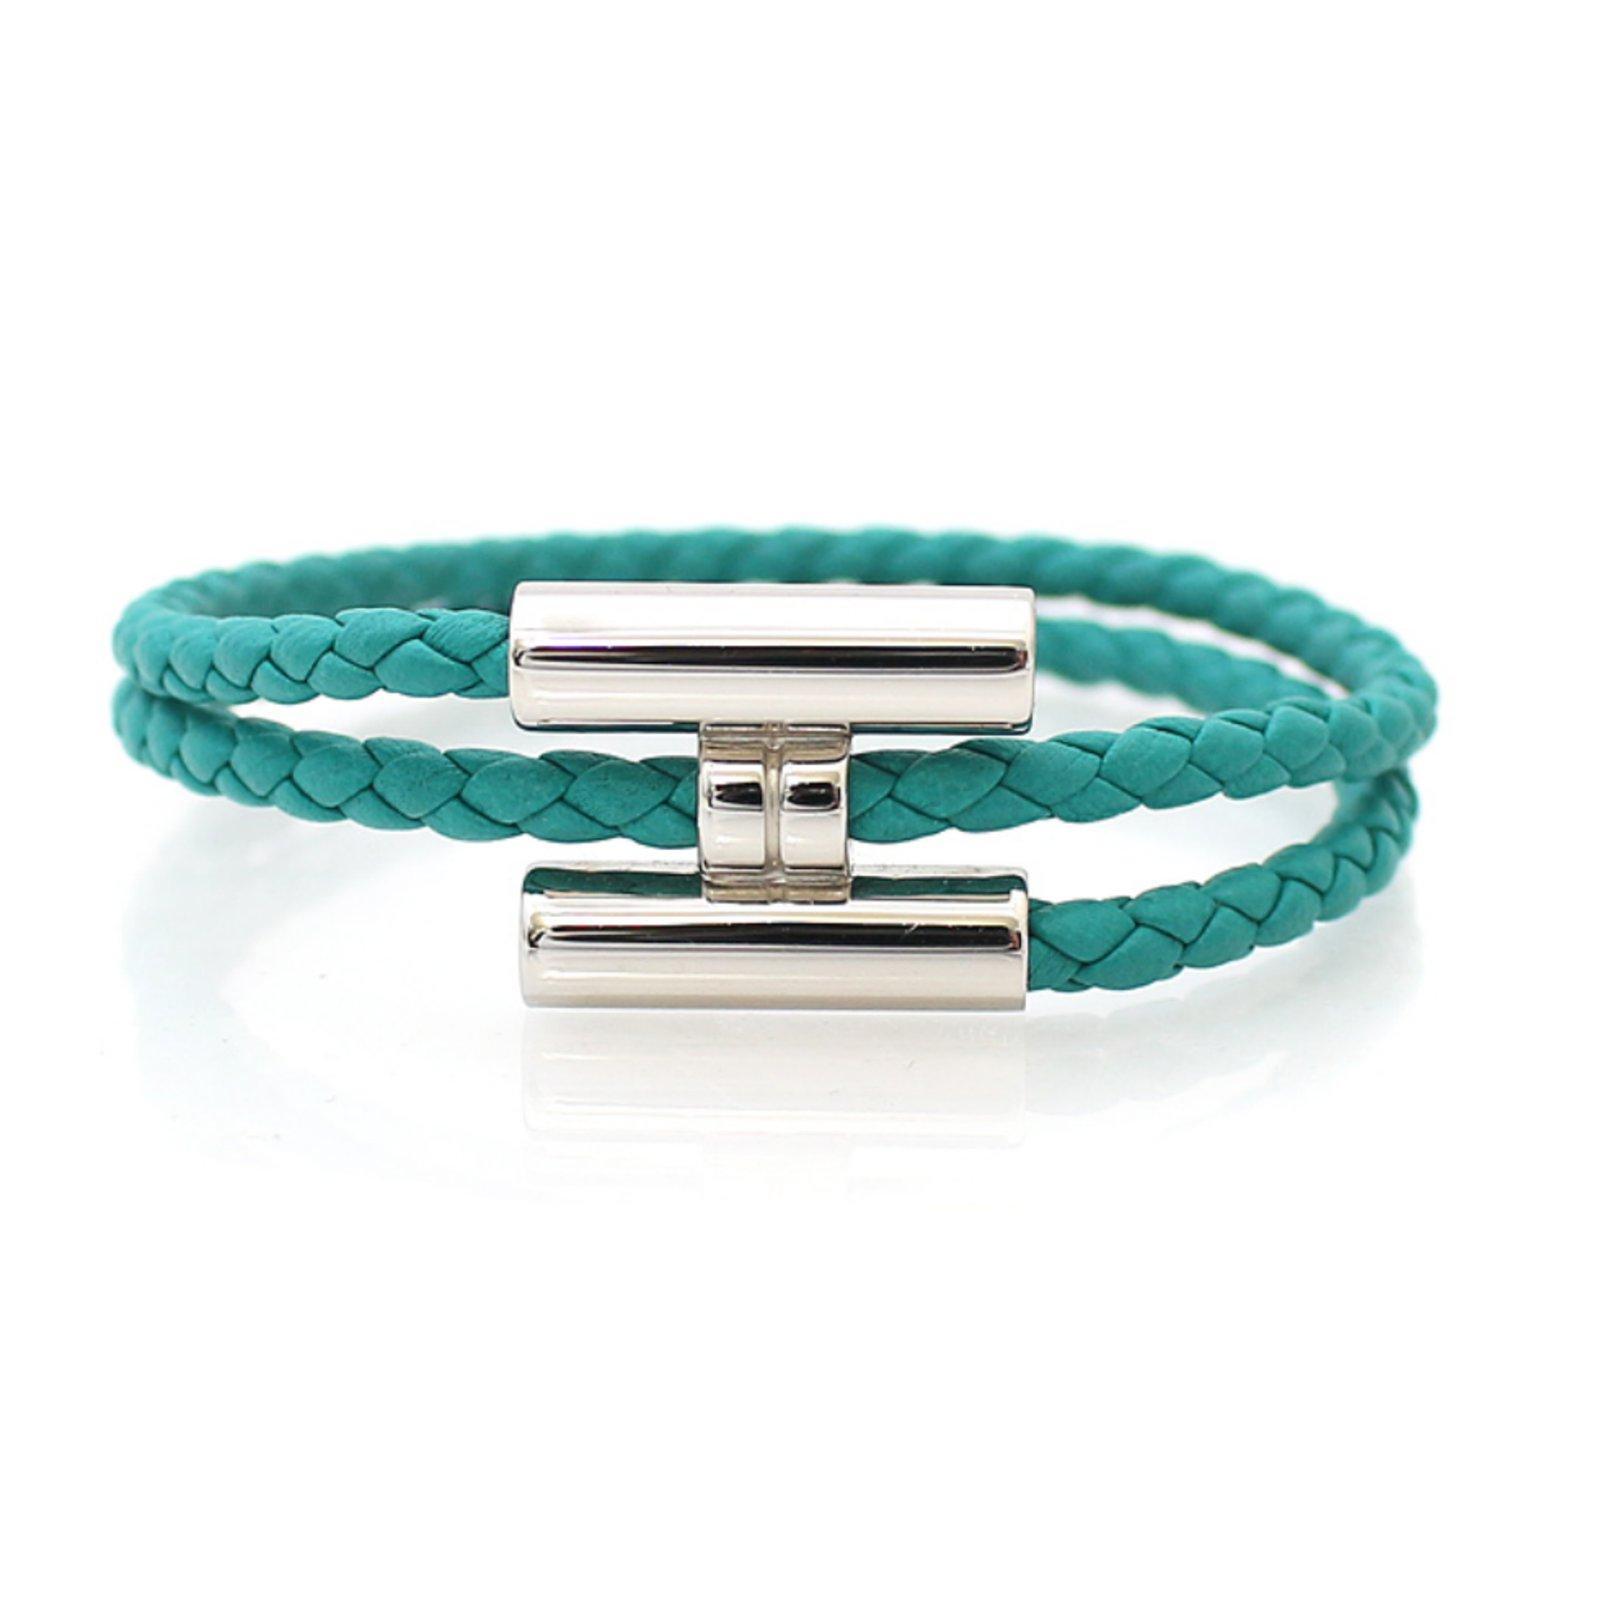 0fd9fdd837 ... spain hermès bracelet tournis tressé wallets small accessories leather  blue ref.56129 joli closet 1dd7c